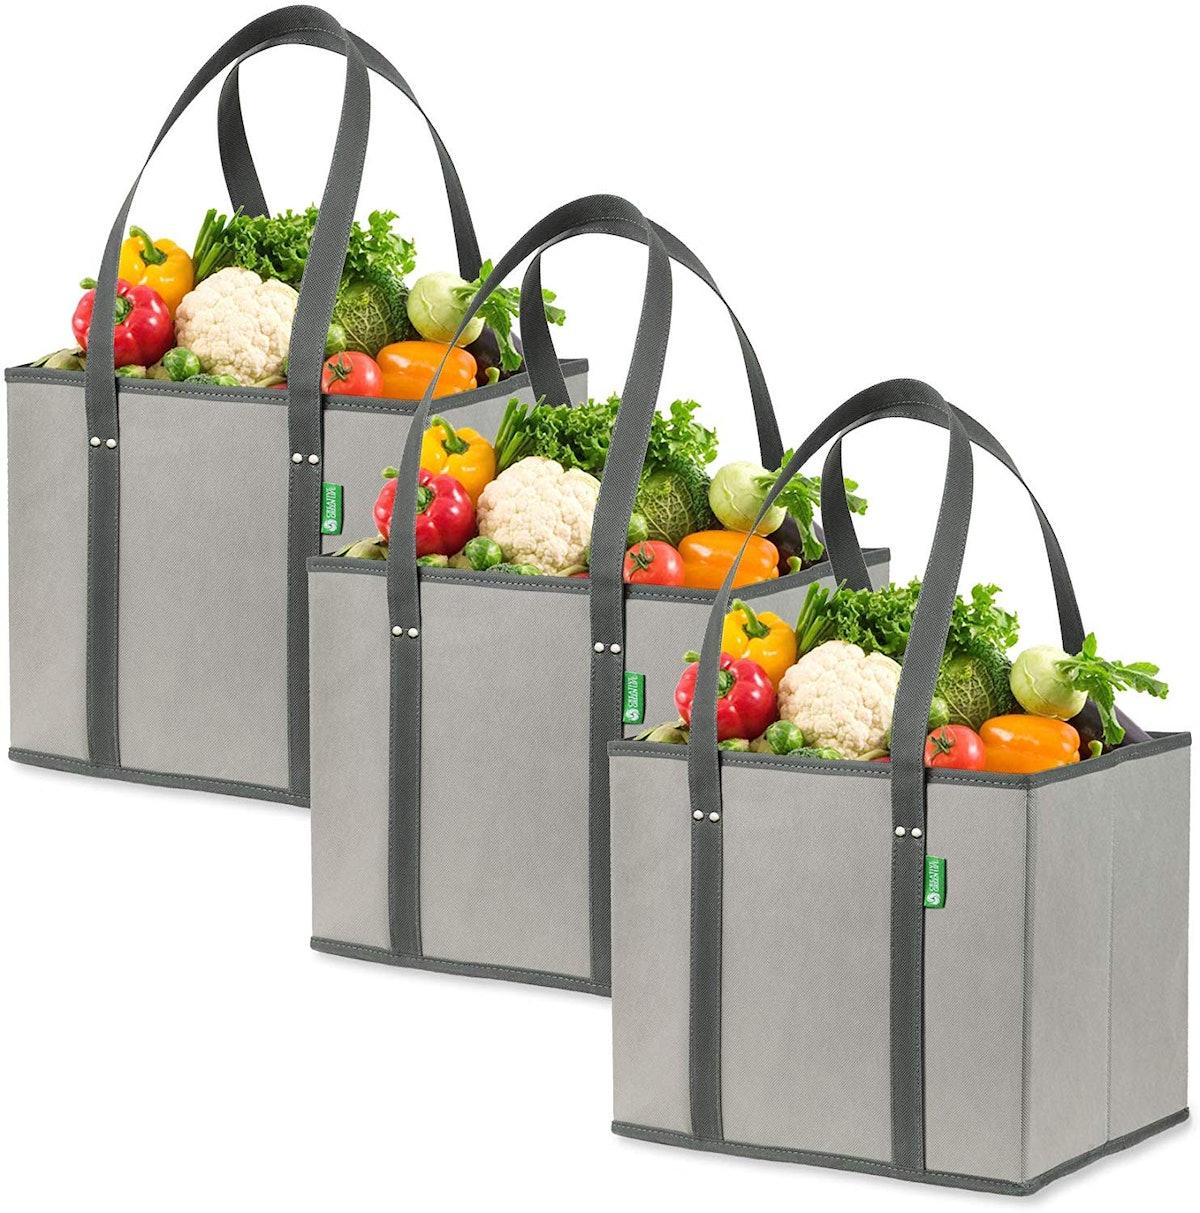 Creative Green Life Reusable Box Bags (3-Pack)